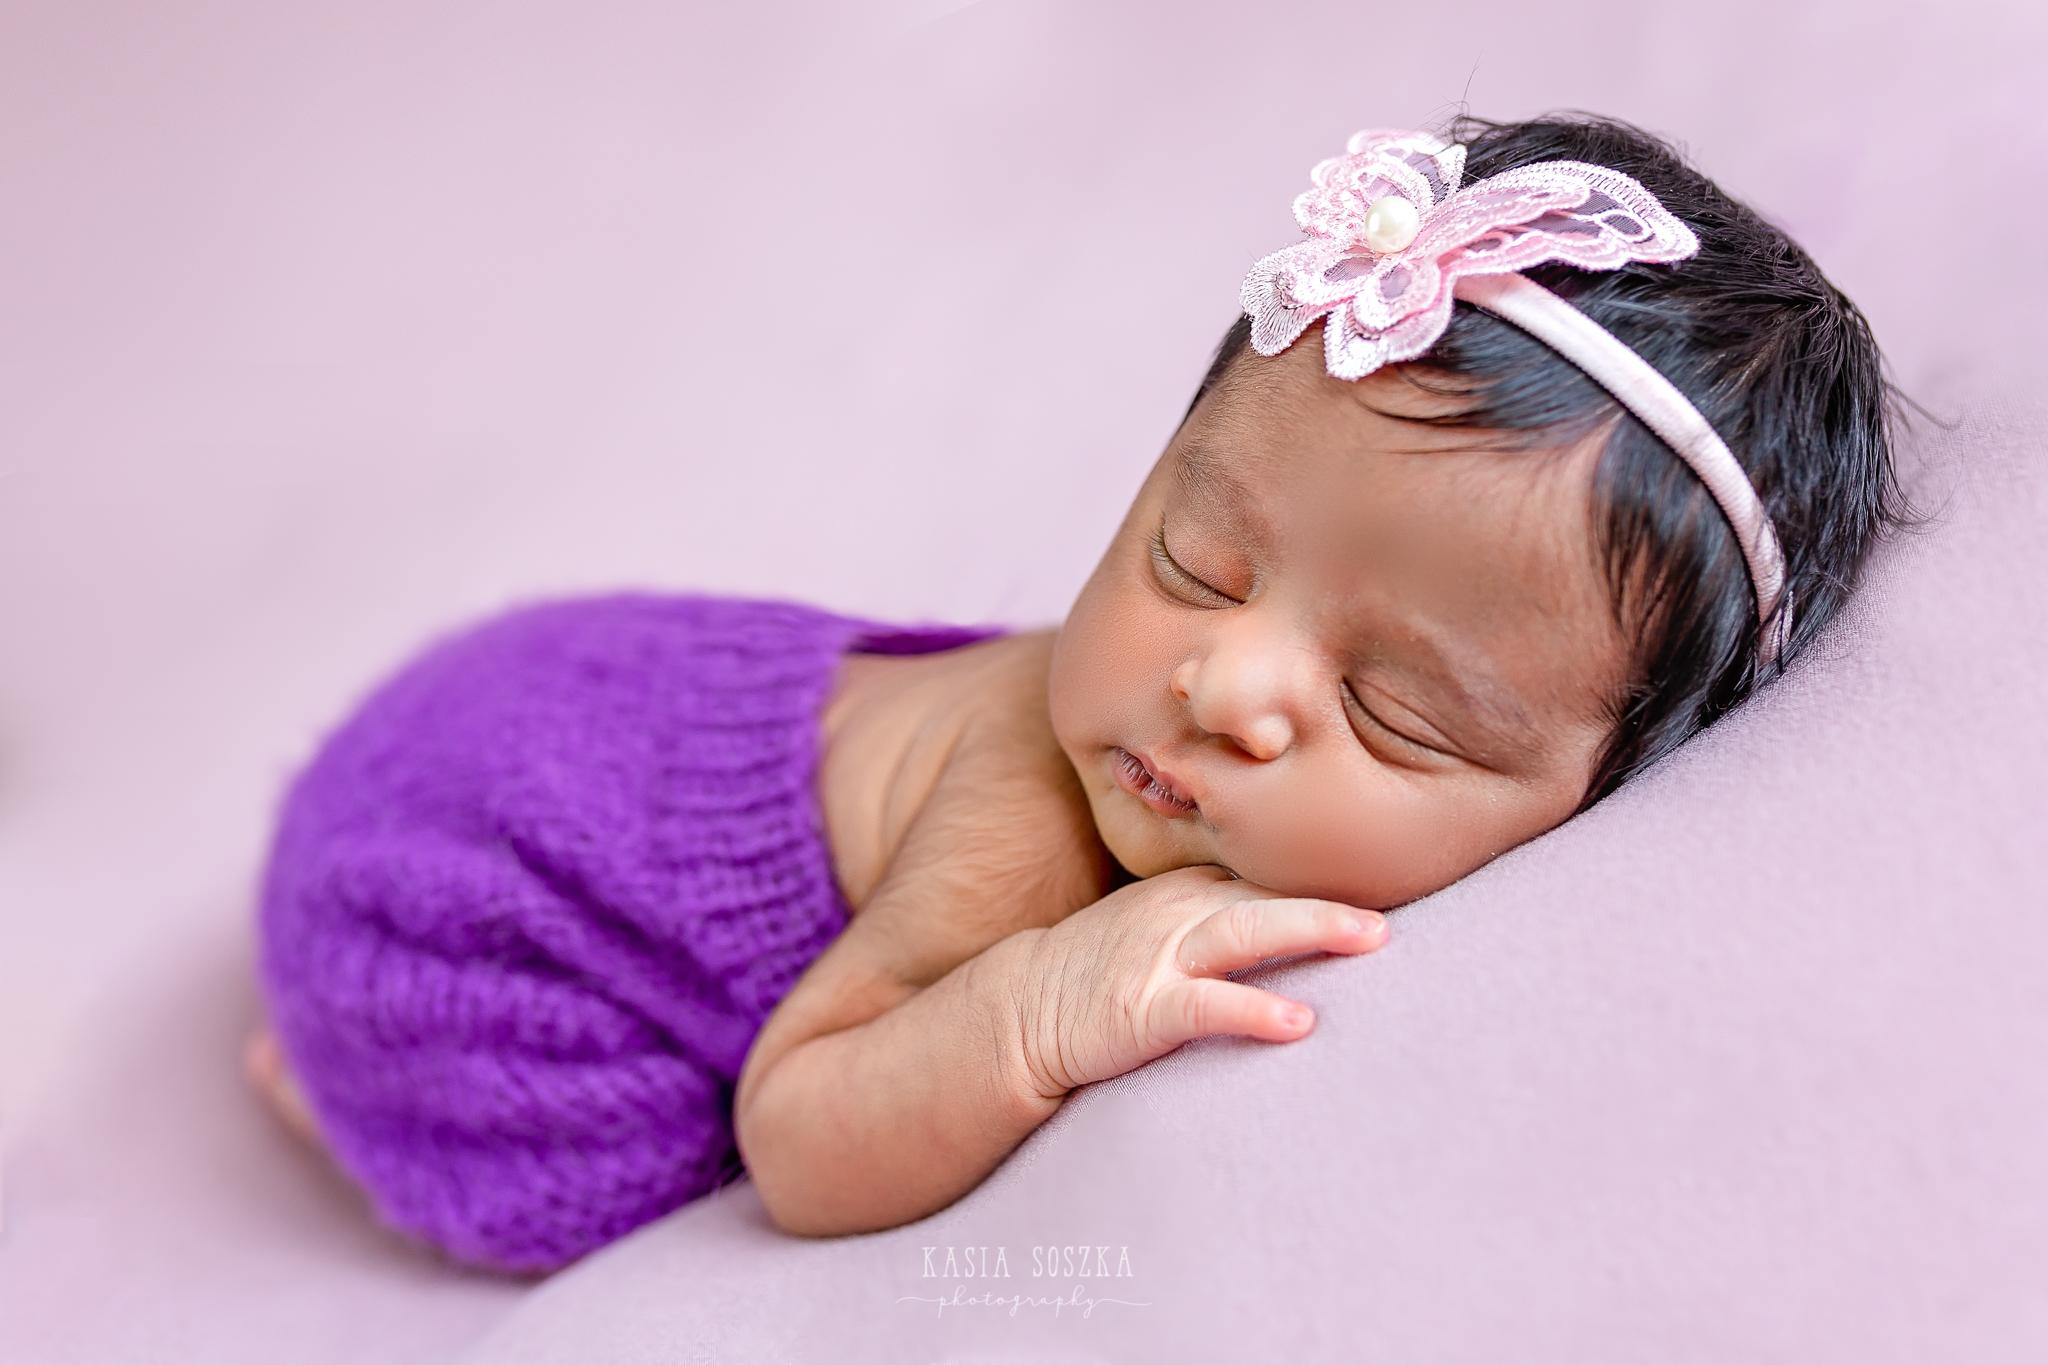 Newborn photography Leeds-Bradford-York-Harrogate: newborn baby girl sleeping on a pink blanket